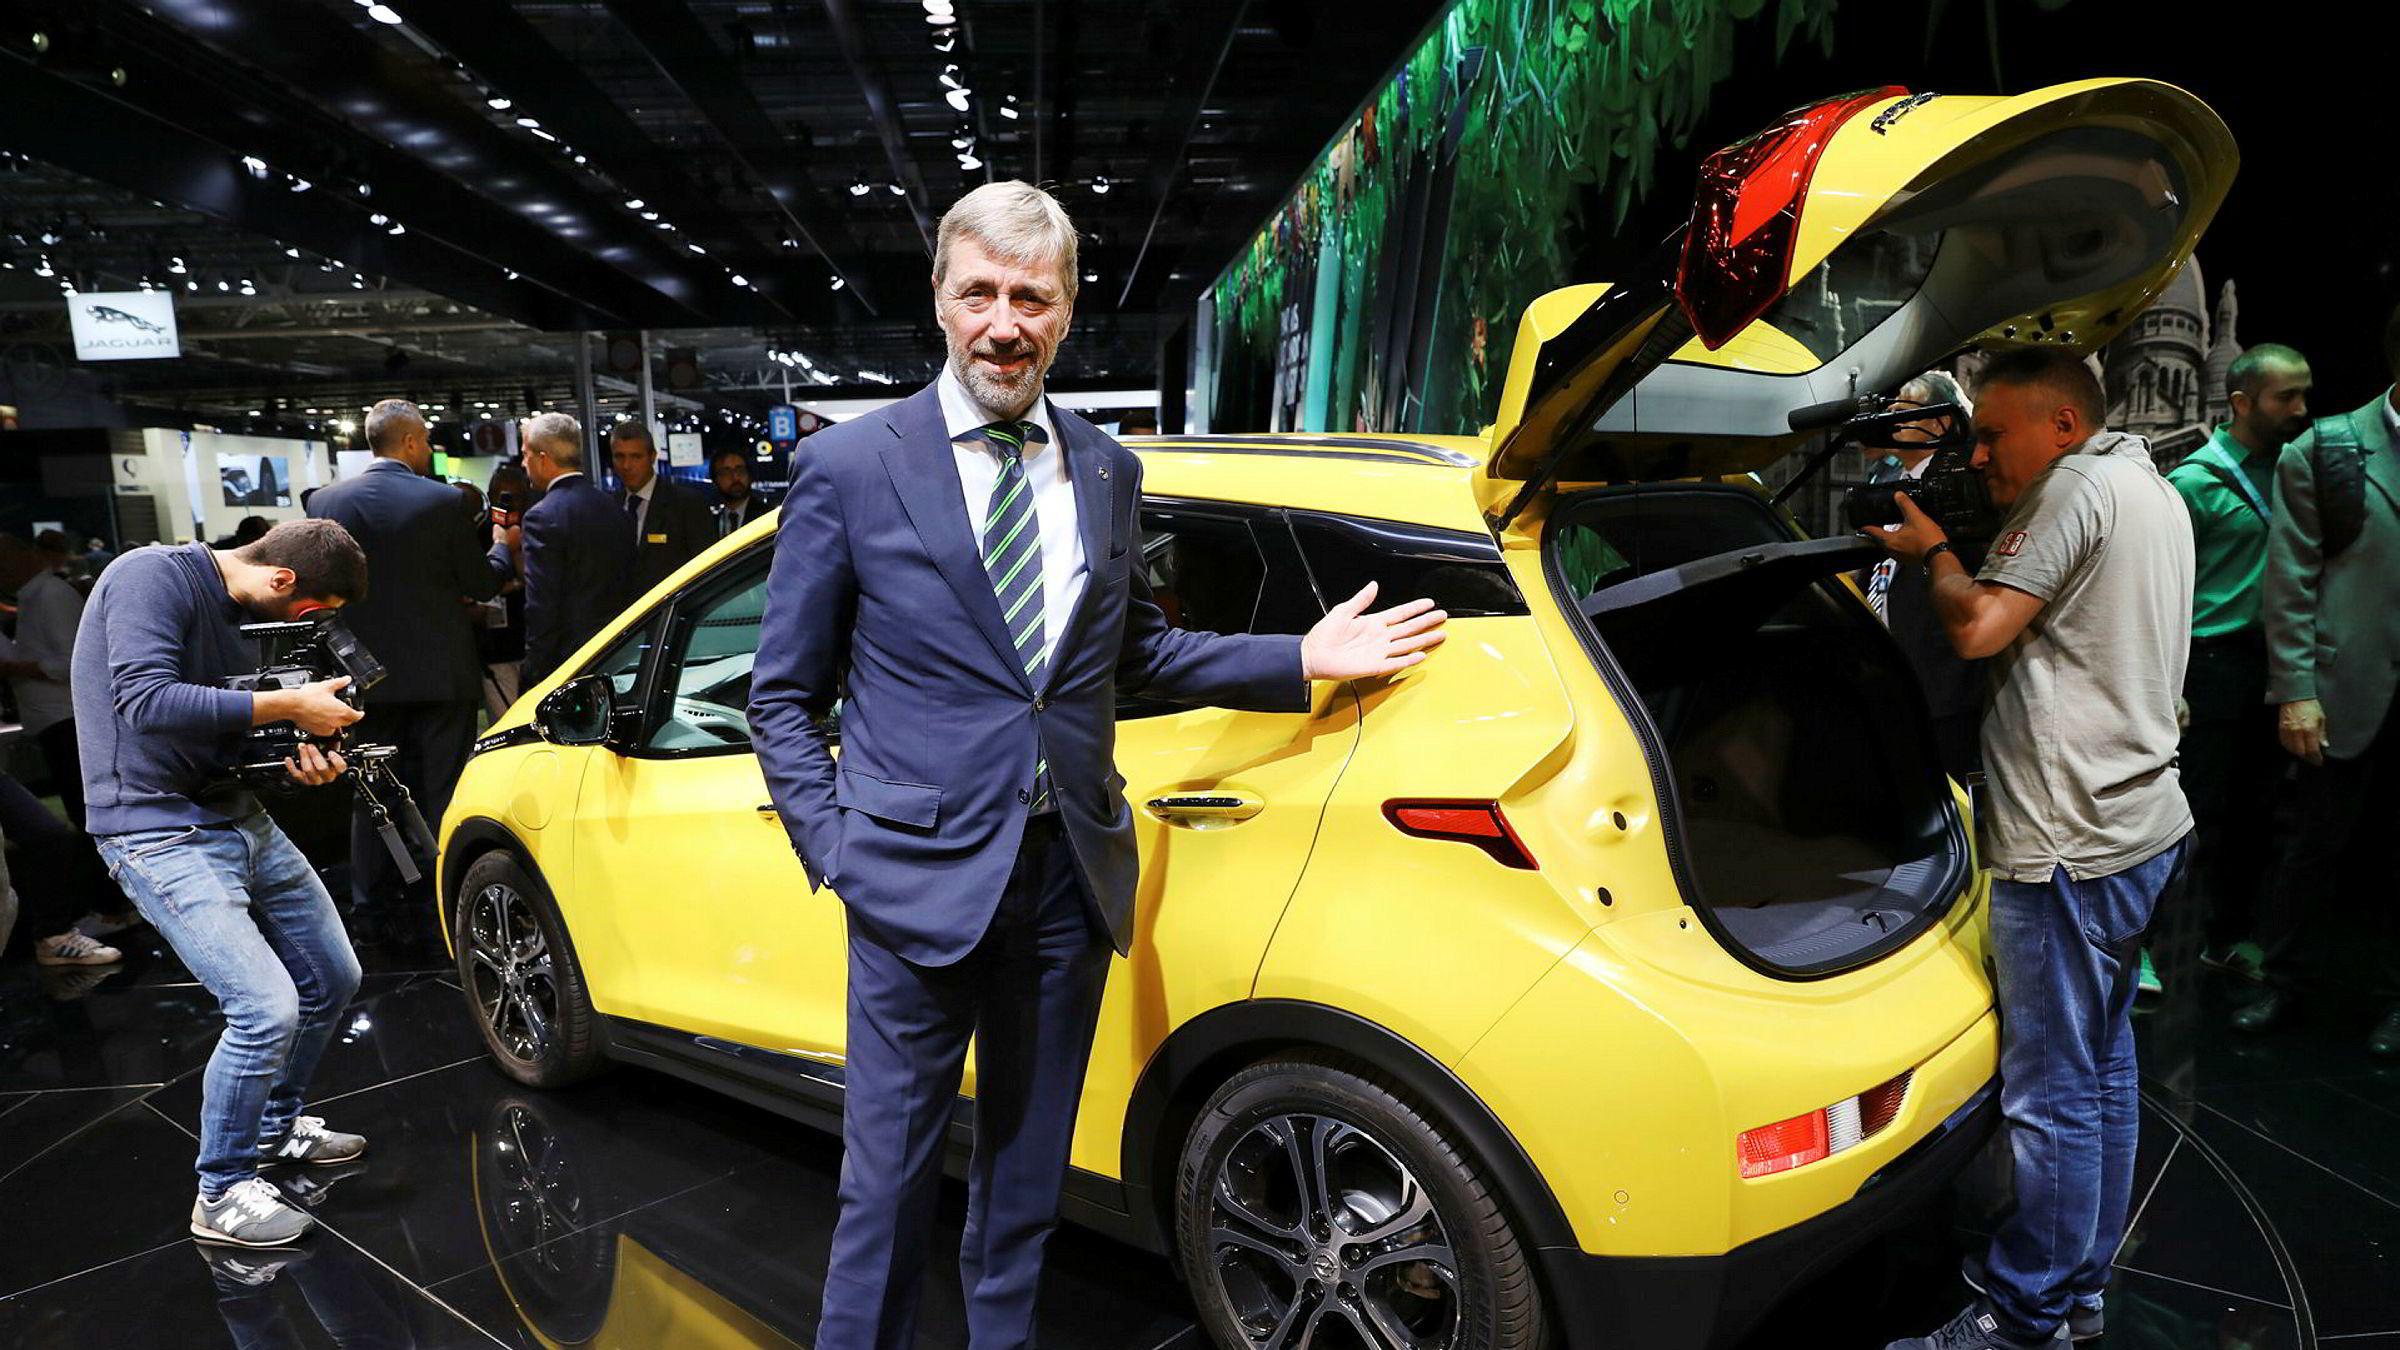 Bernt G. Jessen, adm. dir. i Opel Norge, viser frem Opel Ampera-E under bilmessen i Paris.